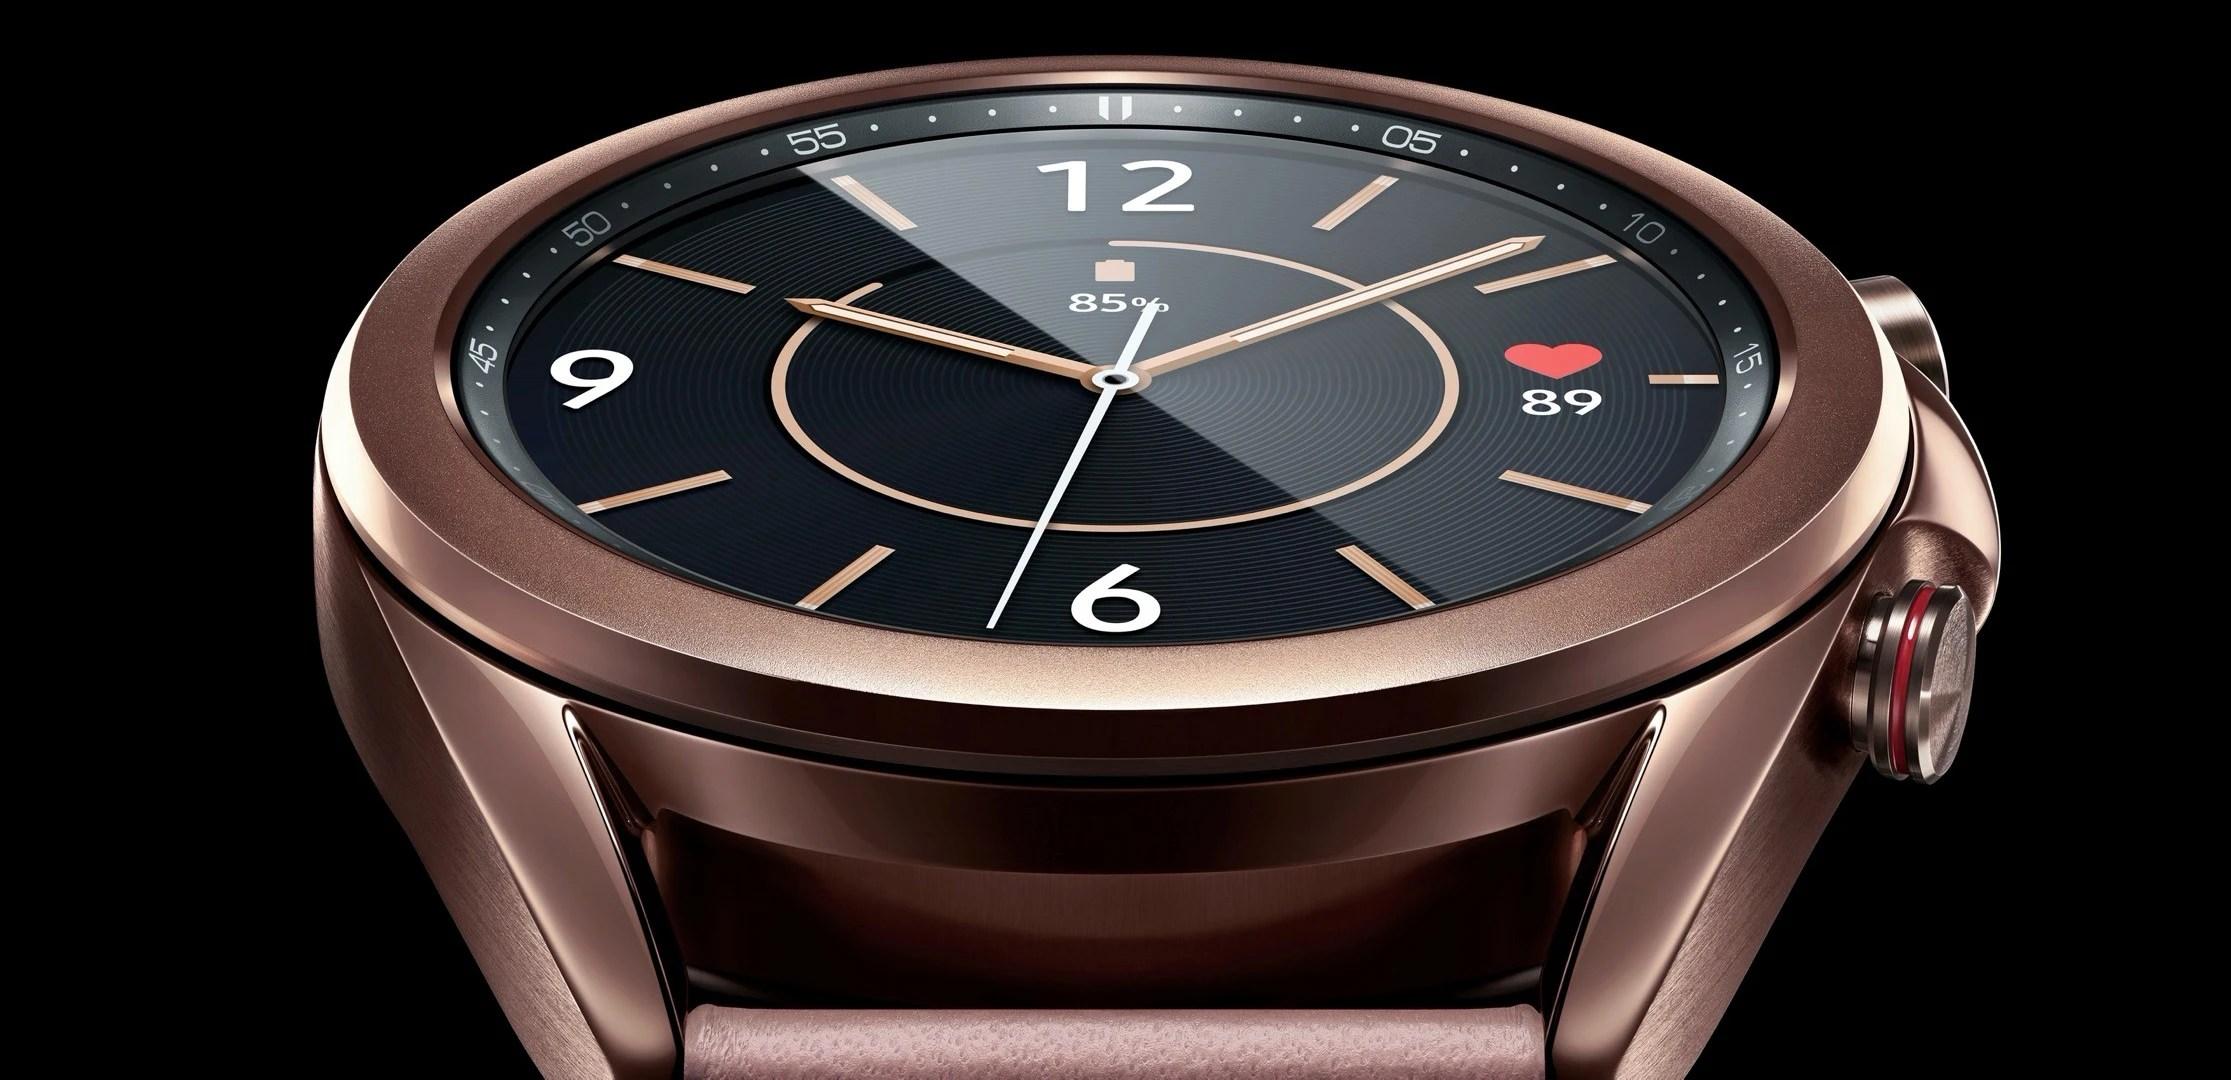 Samsung-Galaxy-Watch-3-leak-renders-specs-01.jpg